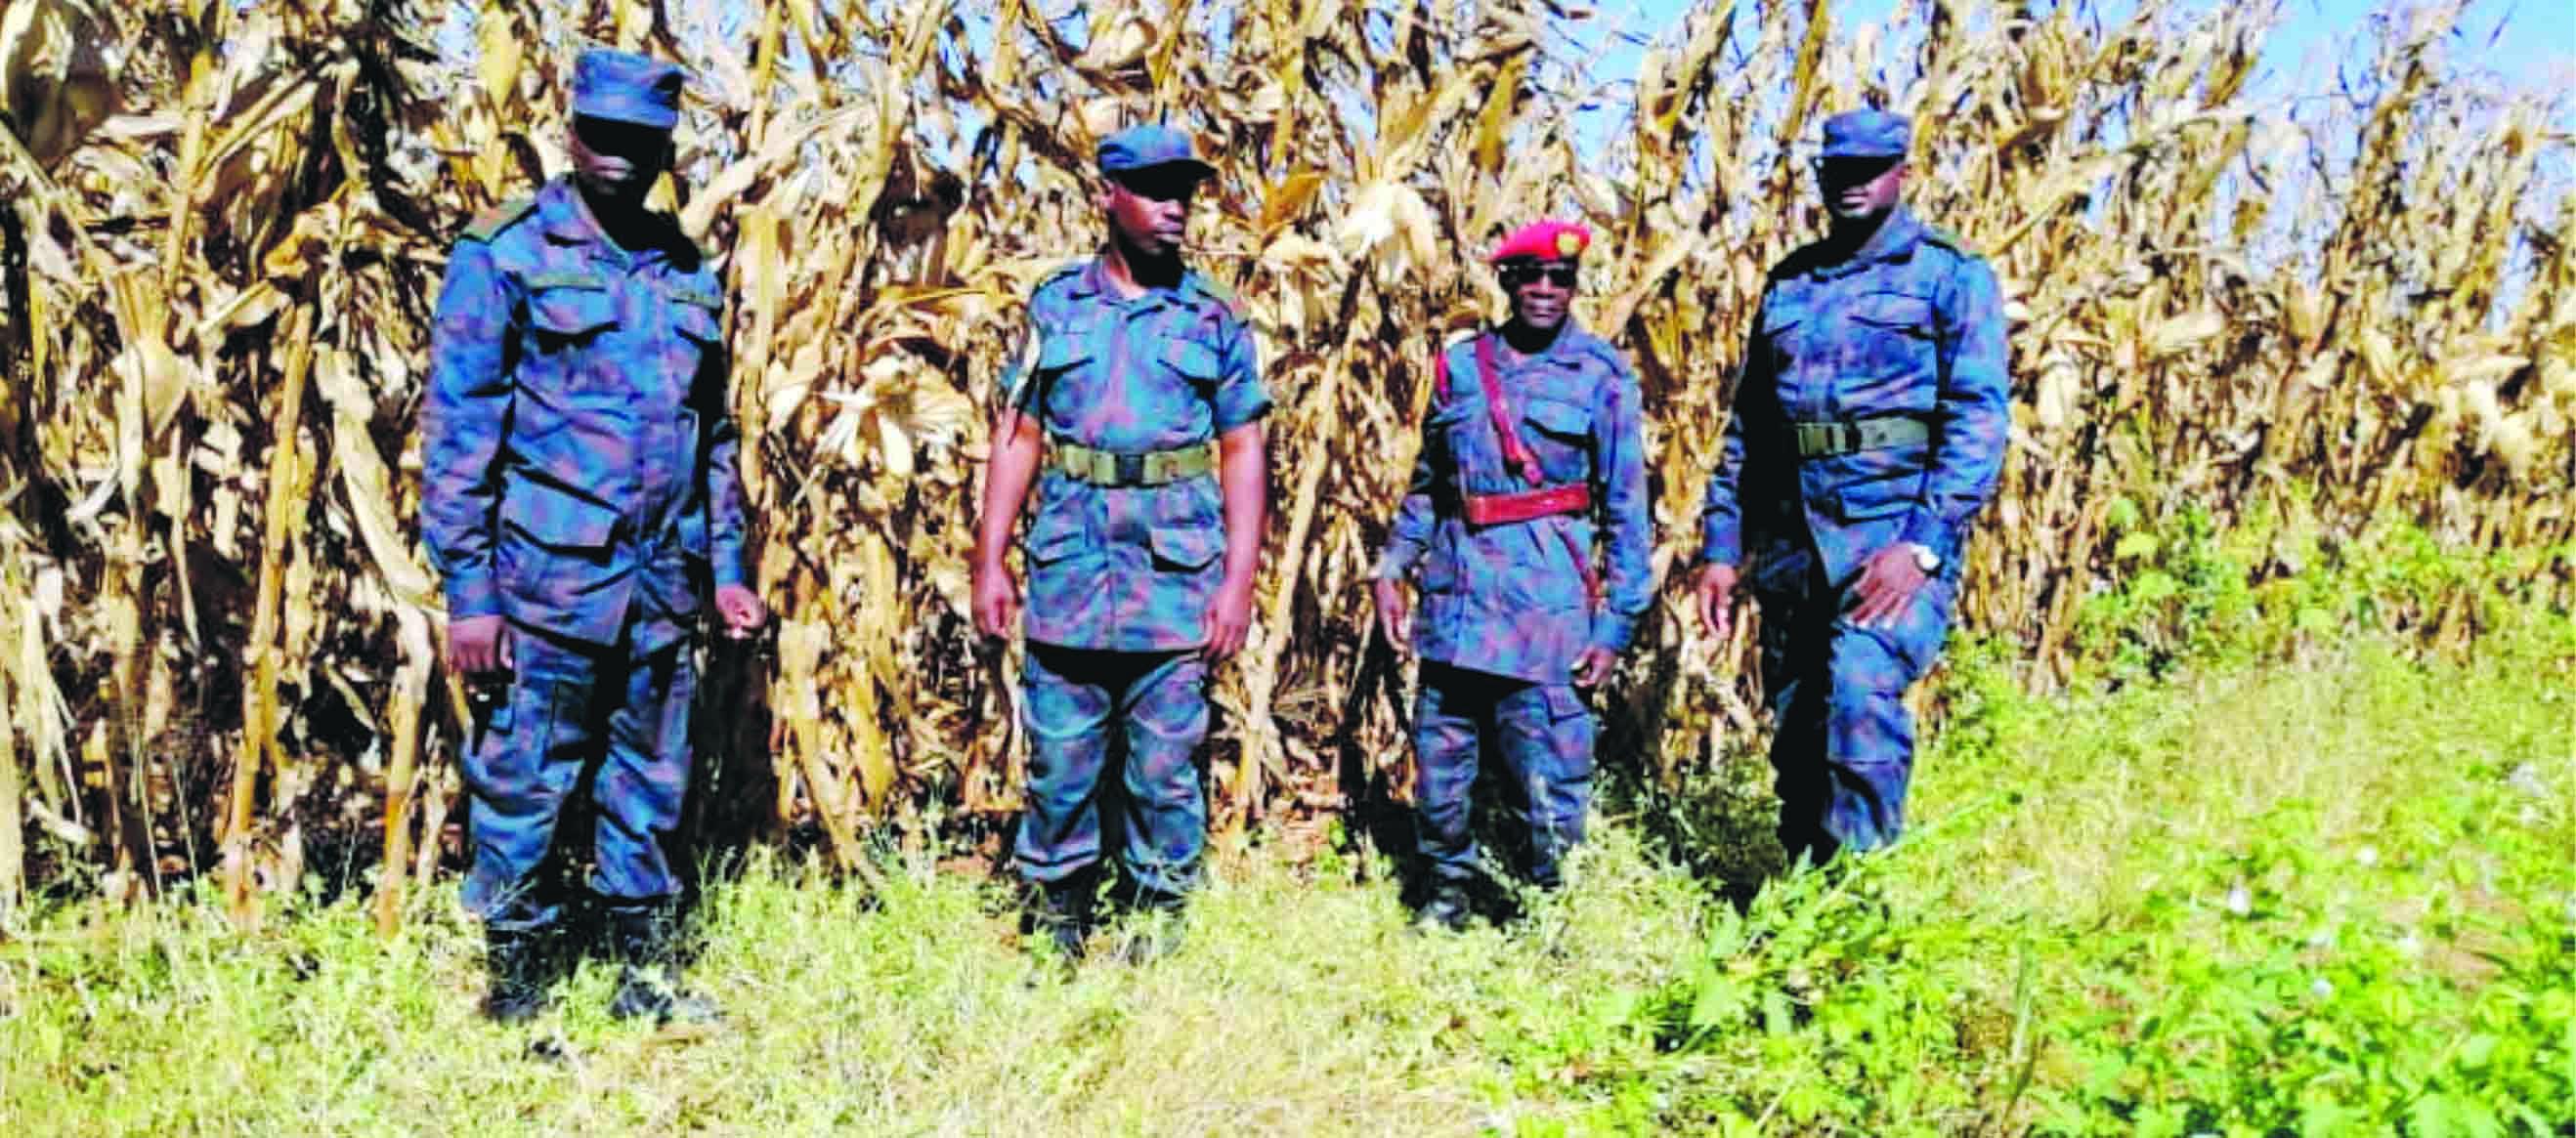 Favourable rains catapult ZNS bumper harvests